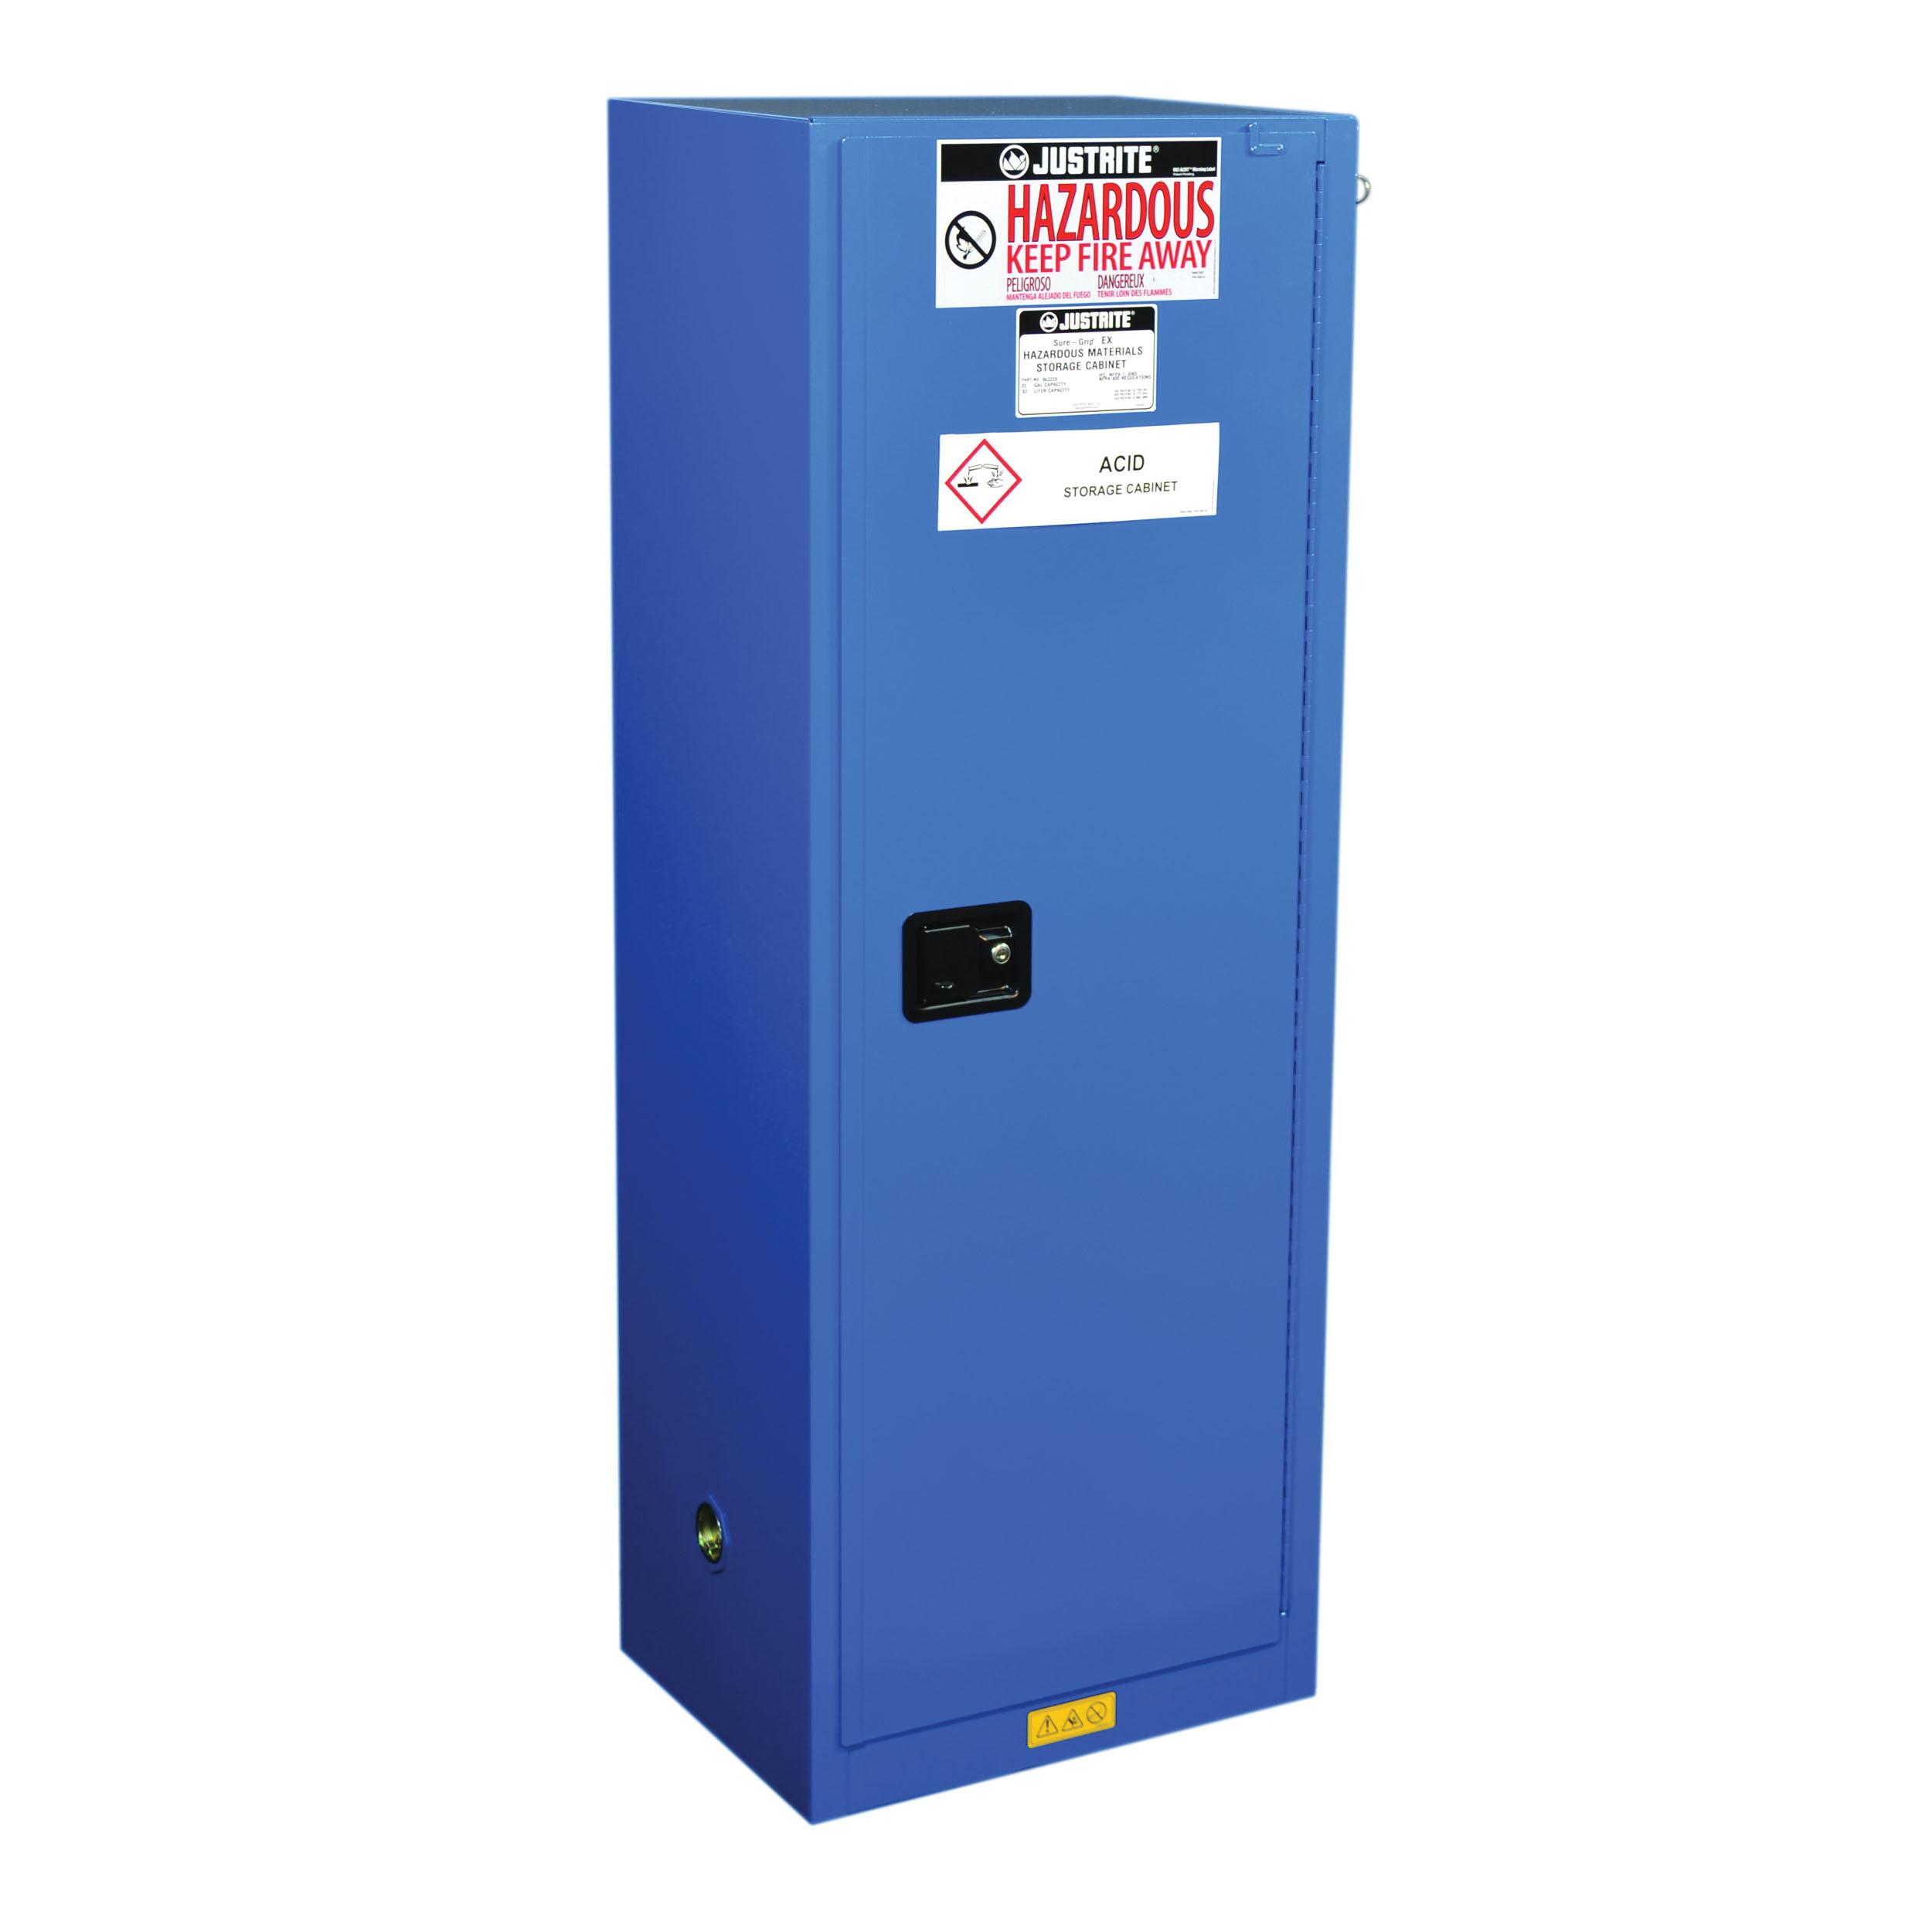 Justrite® 8622282 ChemCor® Standard Slimline Corrosive Safety Cabinet, 22 gal Capacity, U-Loc™ Handle, 65 in H x 23-1/4 in W x 18 in D, Self-Close Door, 1 Door, 3 Shelves, 18 ga Cold Rolled Steel, Royal Blue